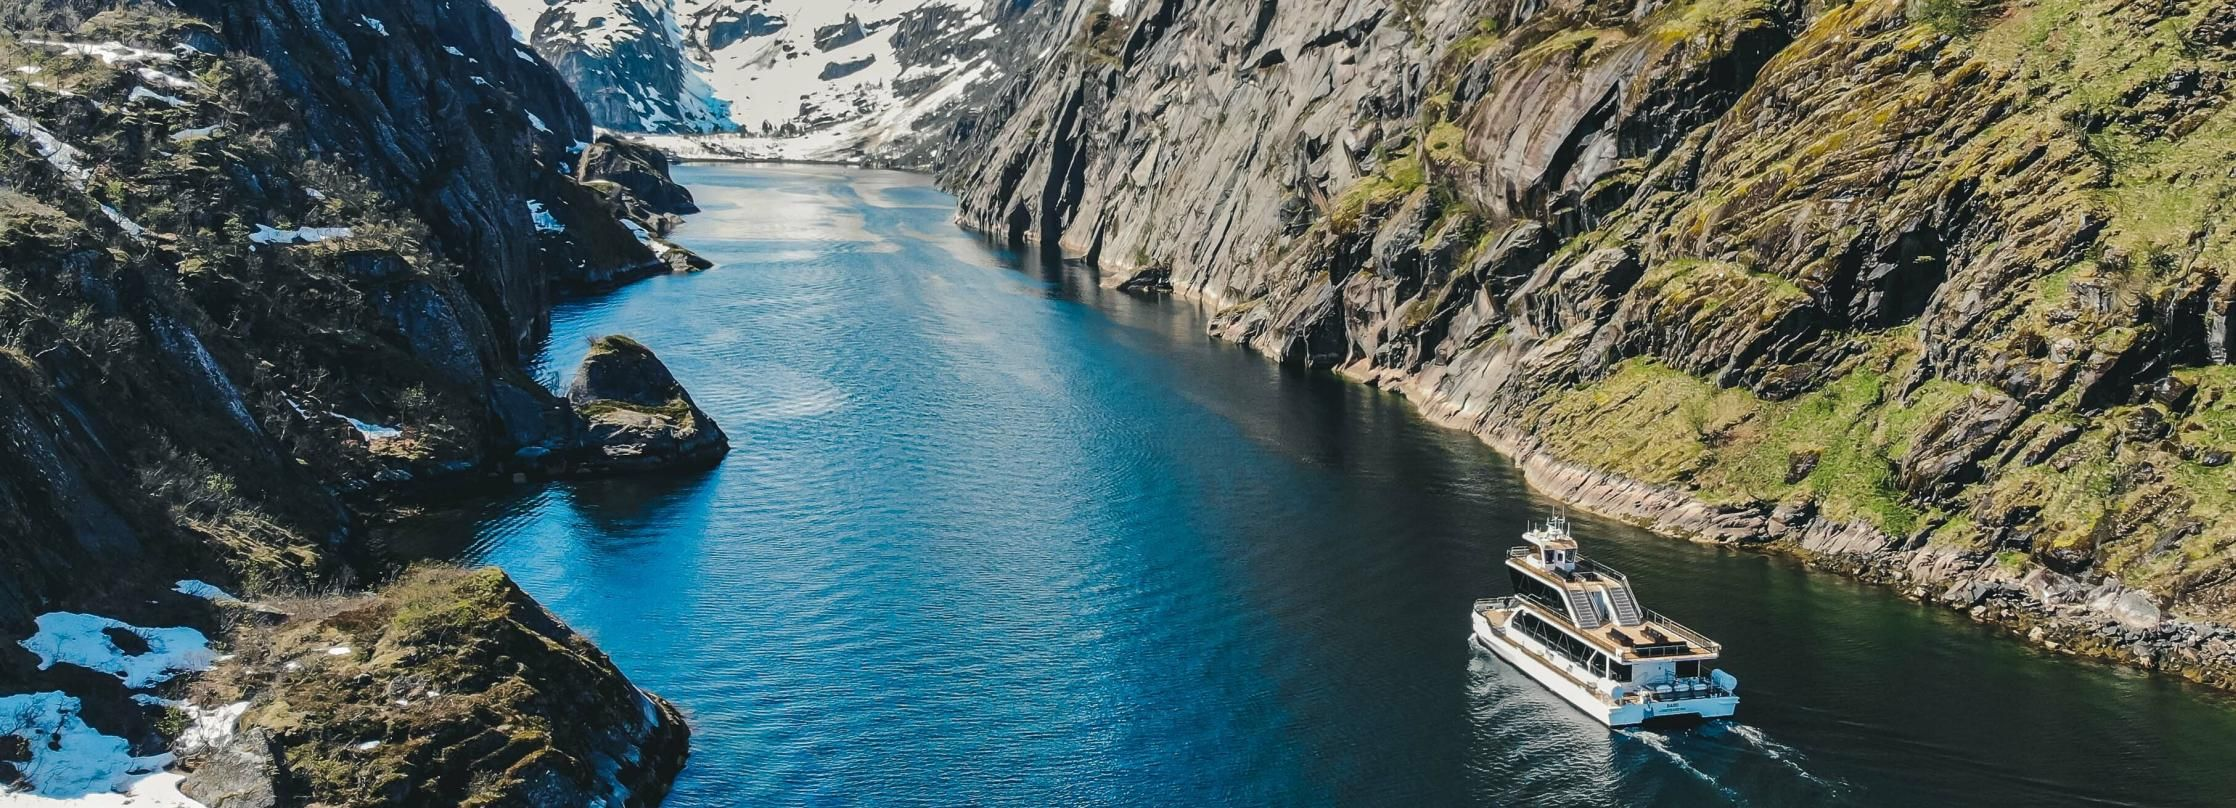 Lofoten Islands: Trollfjord Cruise By Silent Electric Ship